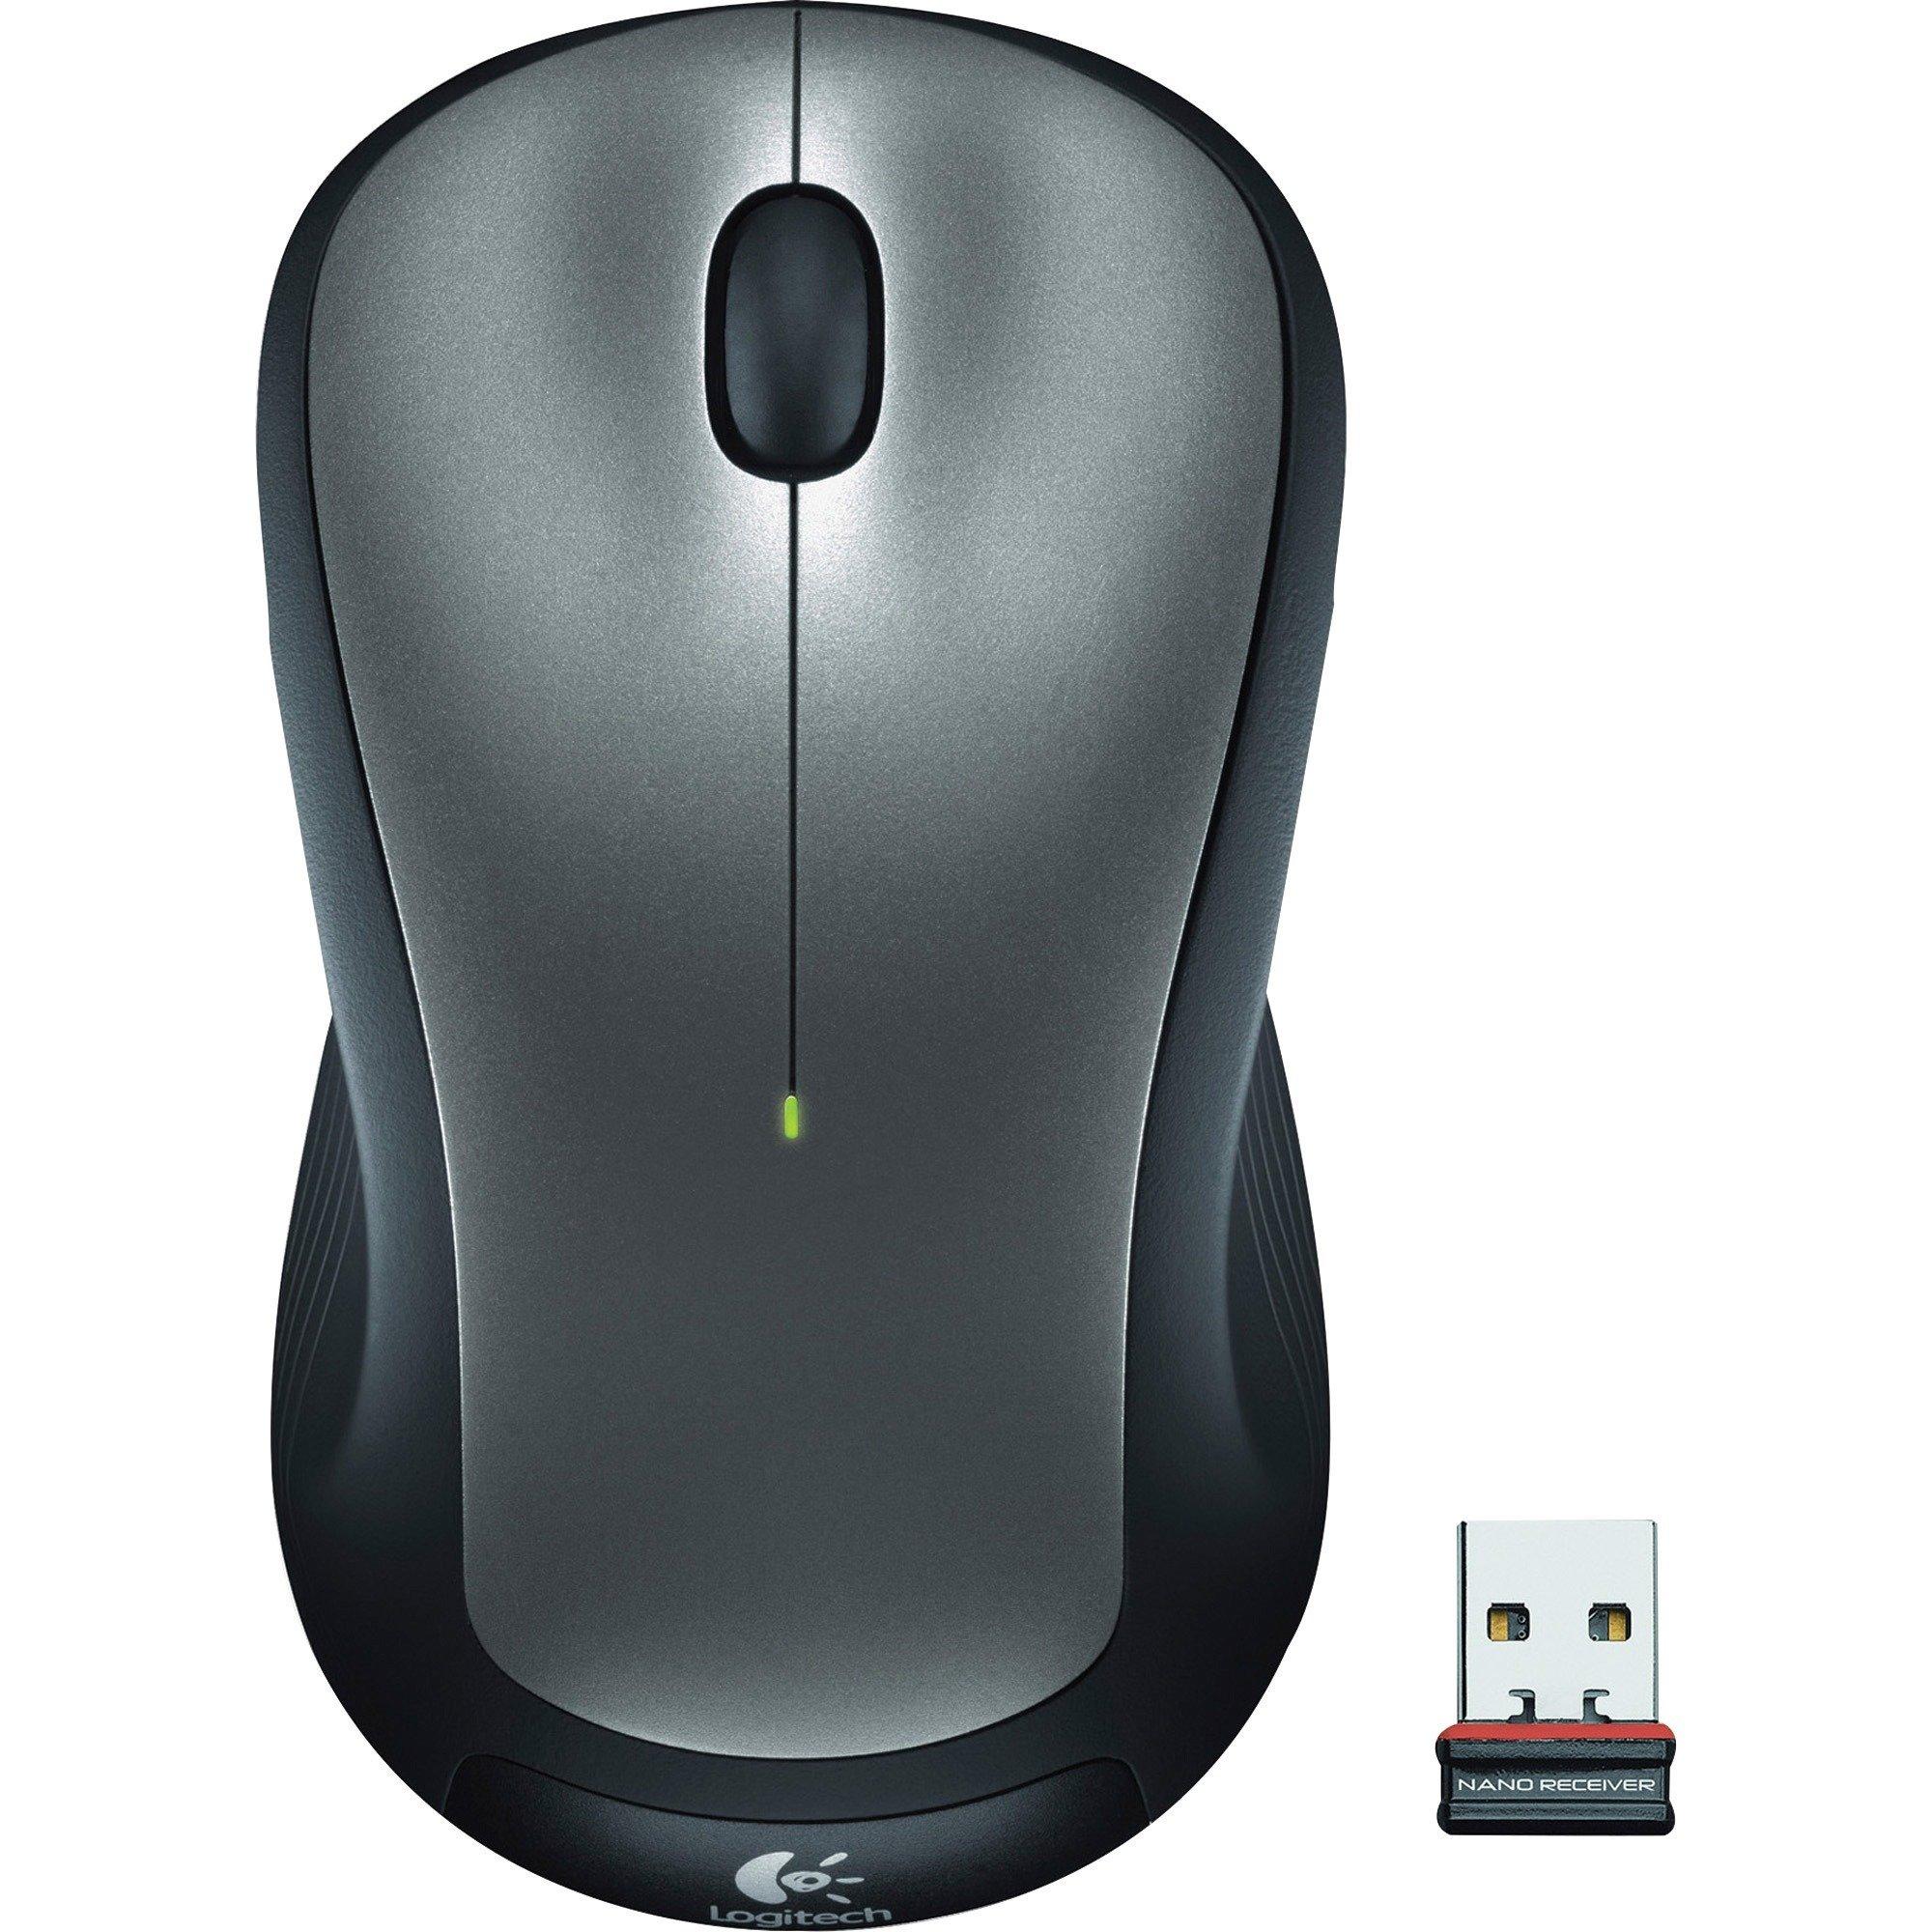 Logitech M310 Wireless Mouse - Each